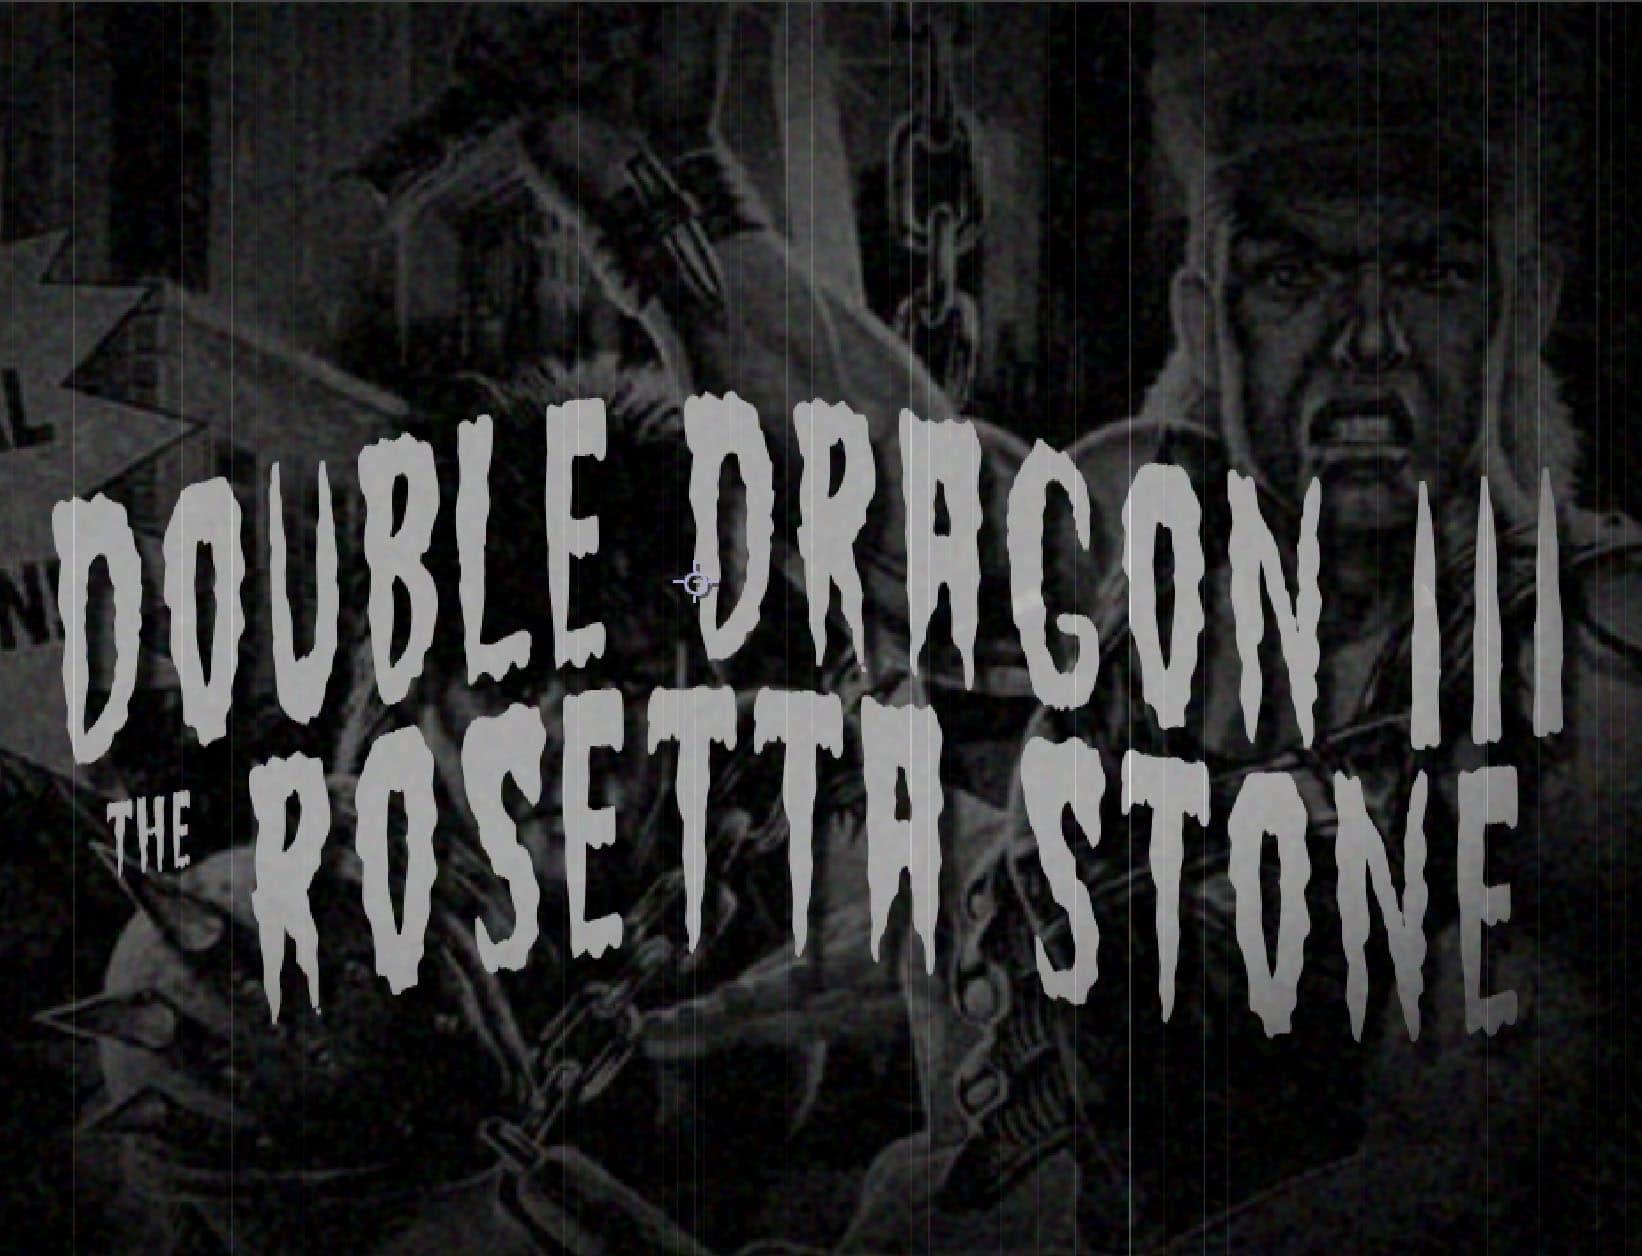 dd3bb - Double Dragon III - The Rosetta Stone (Sega Mega Drive, 1992)